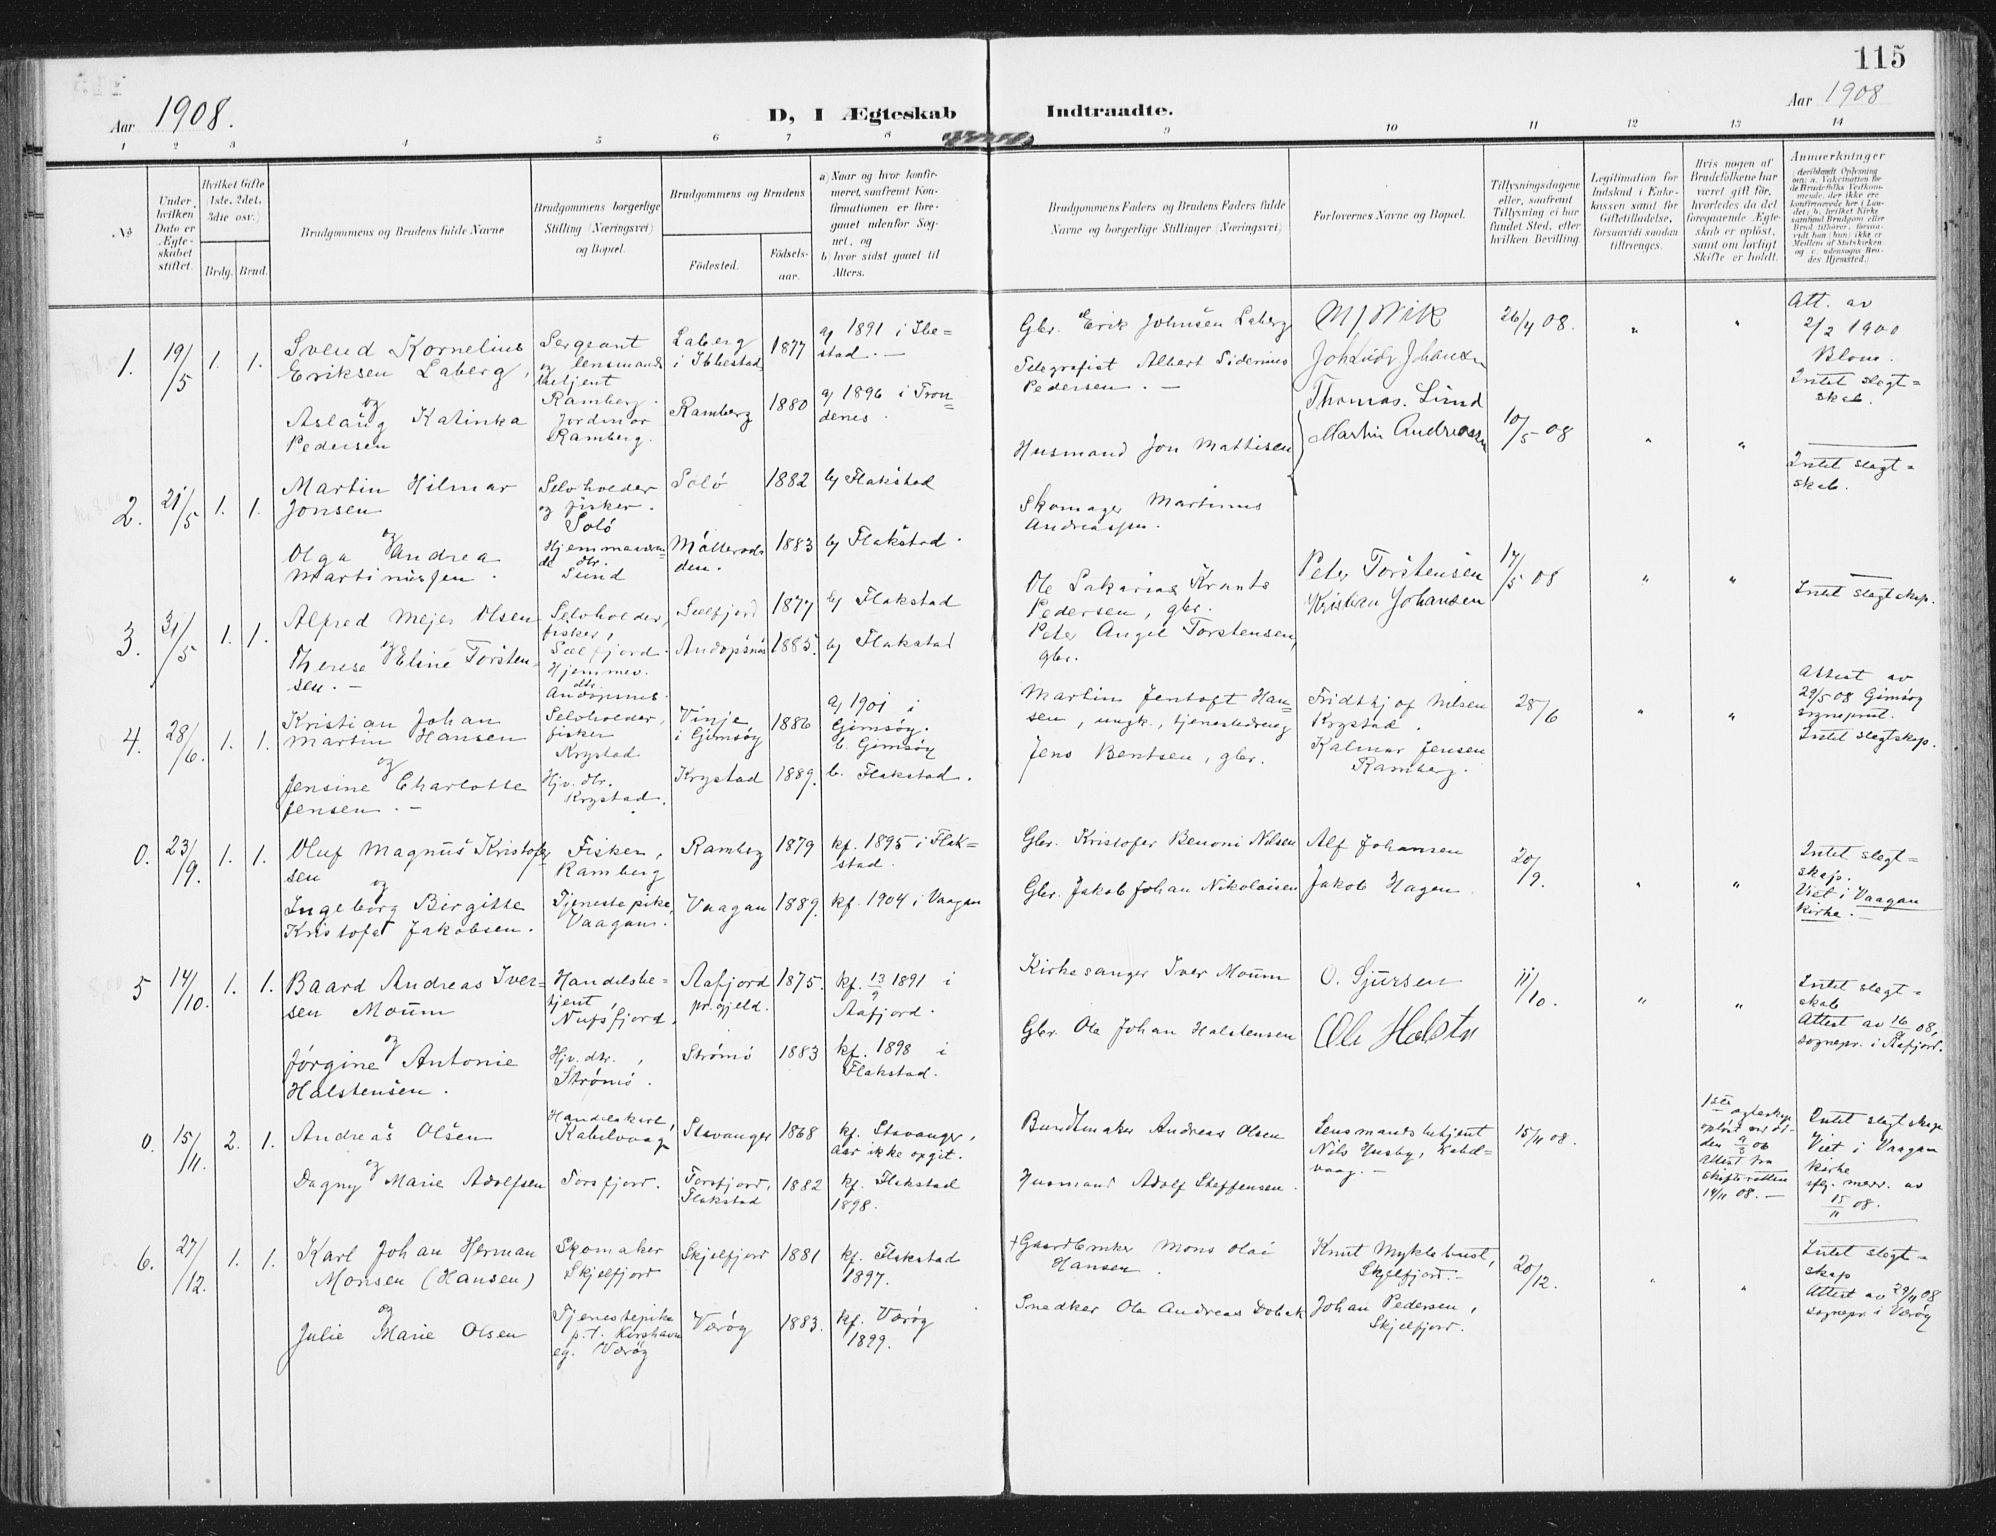 SAT, Ministerialprotokoller, klokkerbøker og fødselsregistre - Nordland, 885/L1206: Ministerialbok nr. 885A07, 1905-1915, s. 115